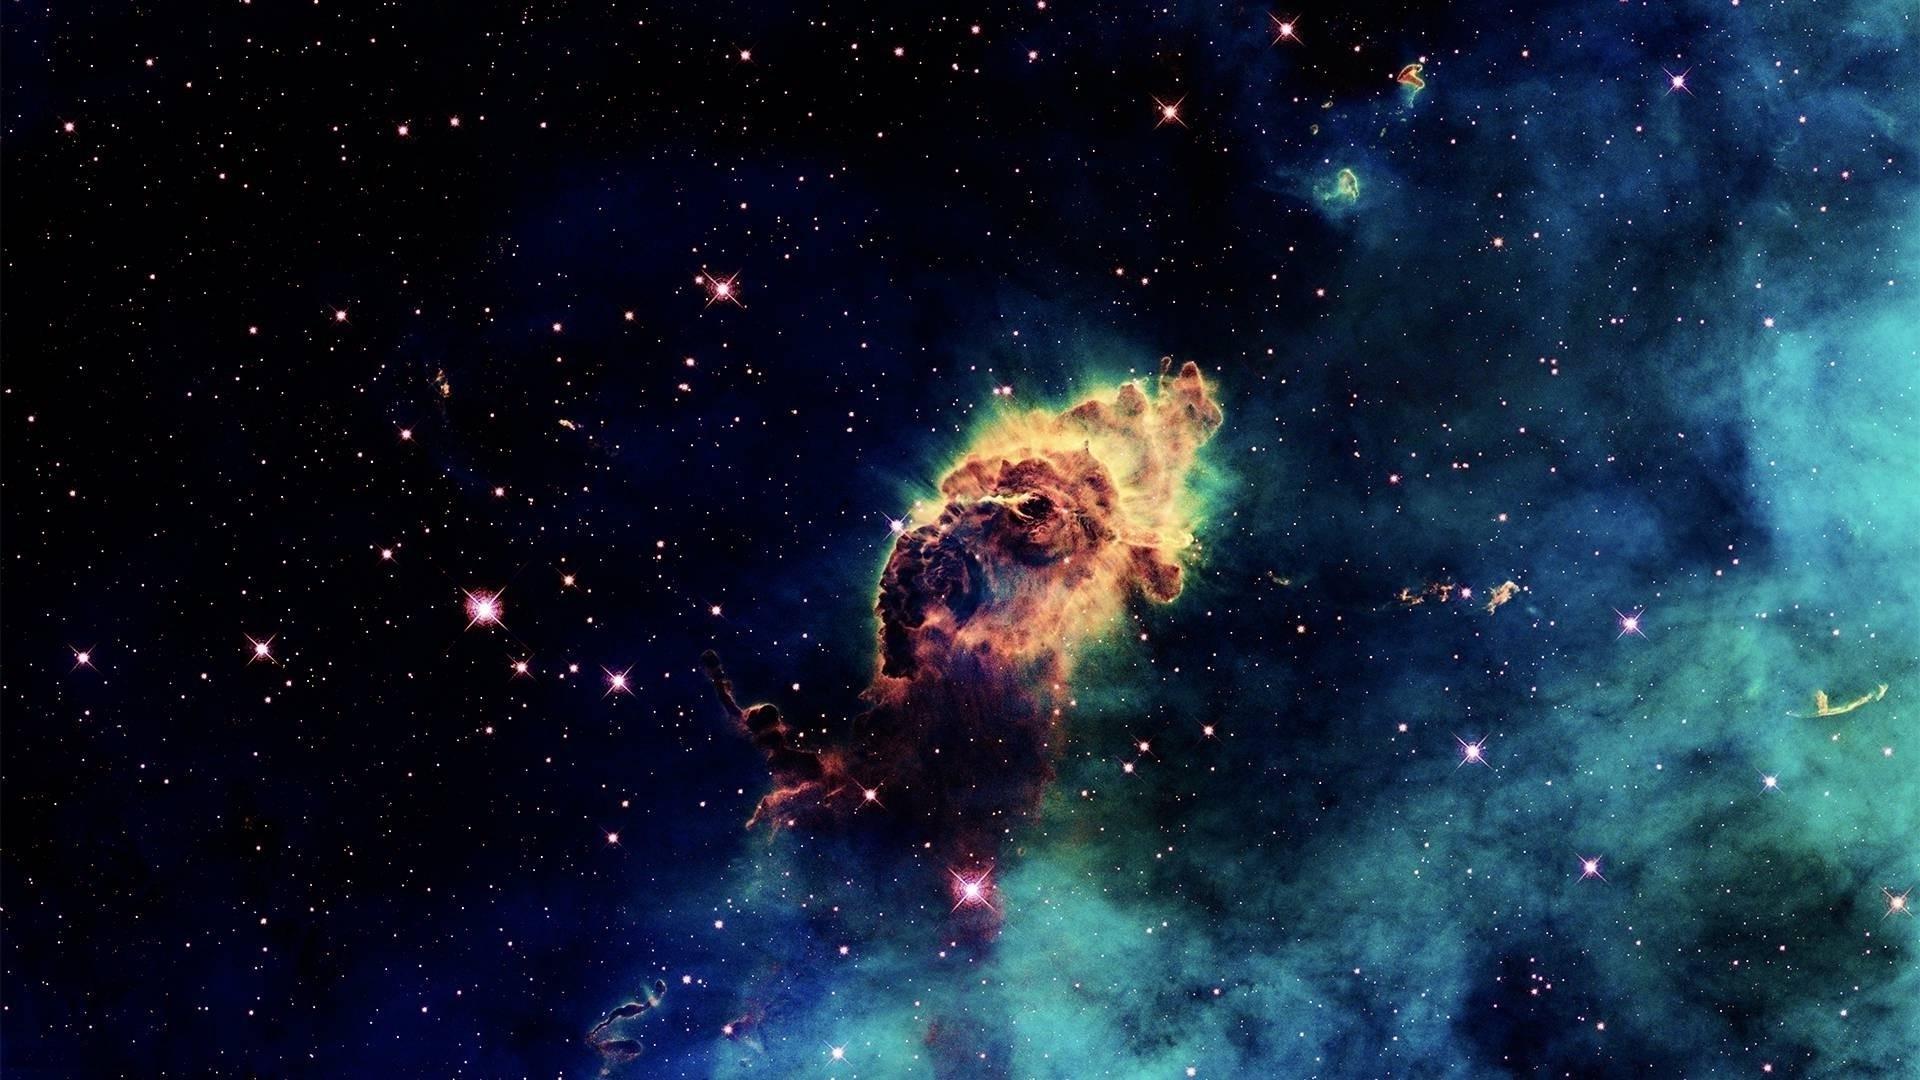 Nebulosas espaciales - 1920x1080